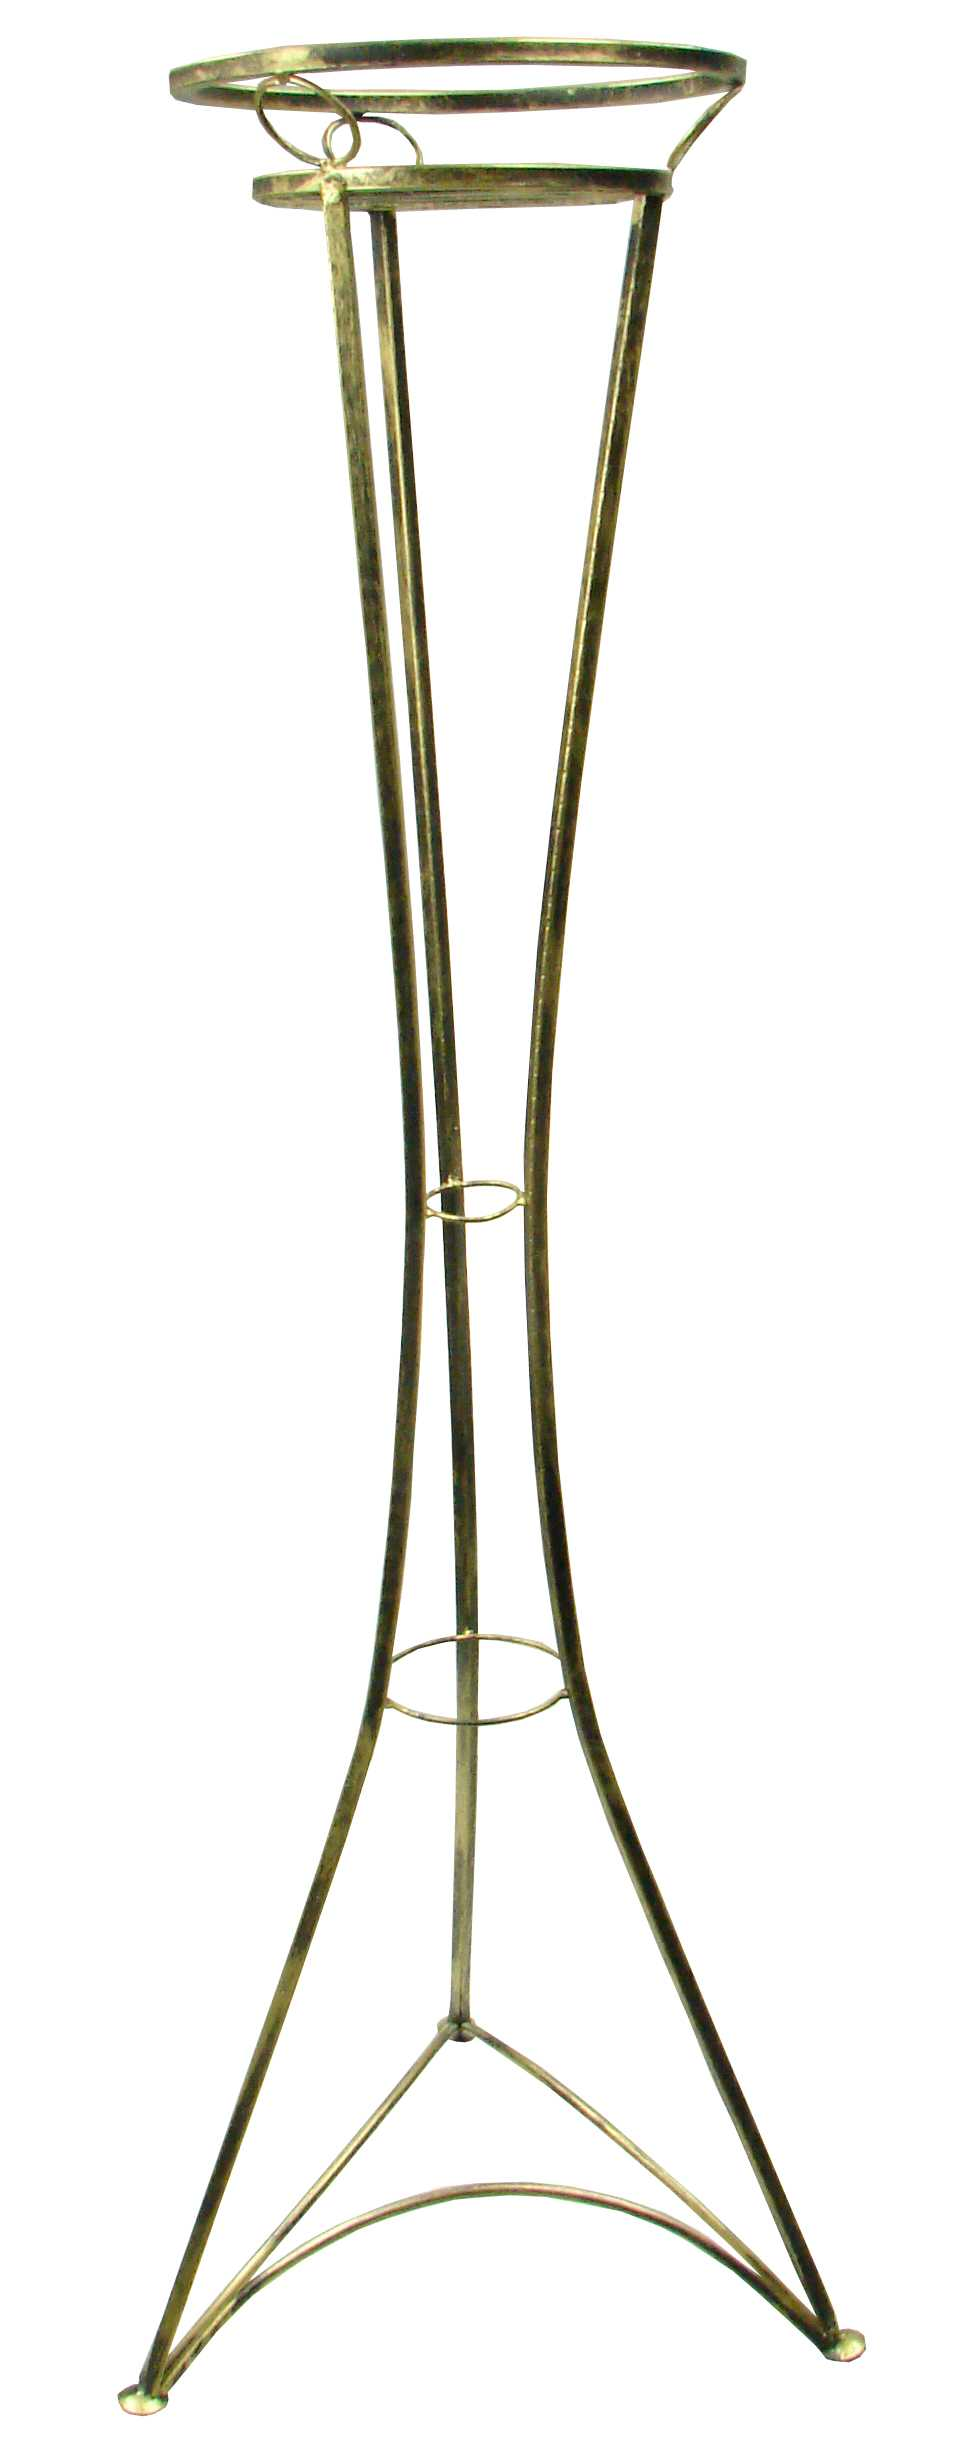 Kvetelná kovaná veža 1 Metaloplastika KWK-808